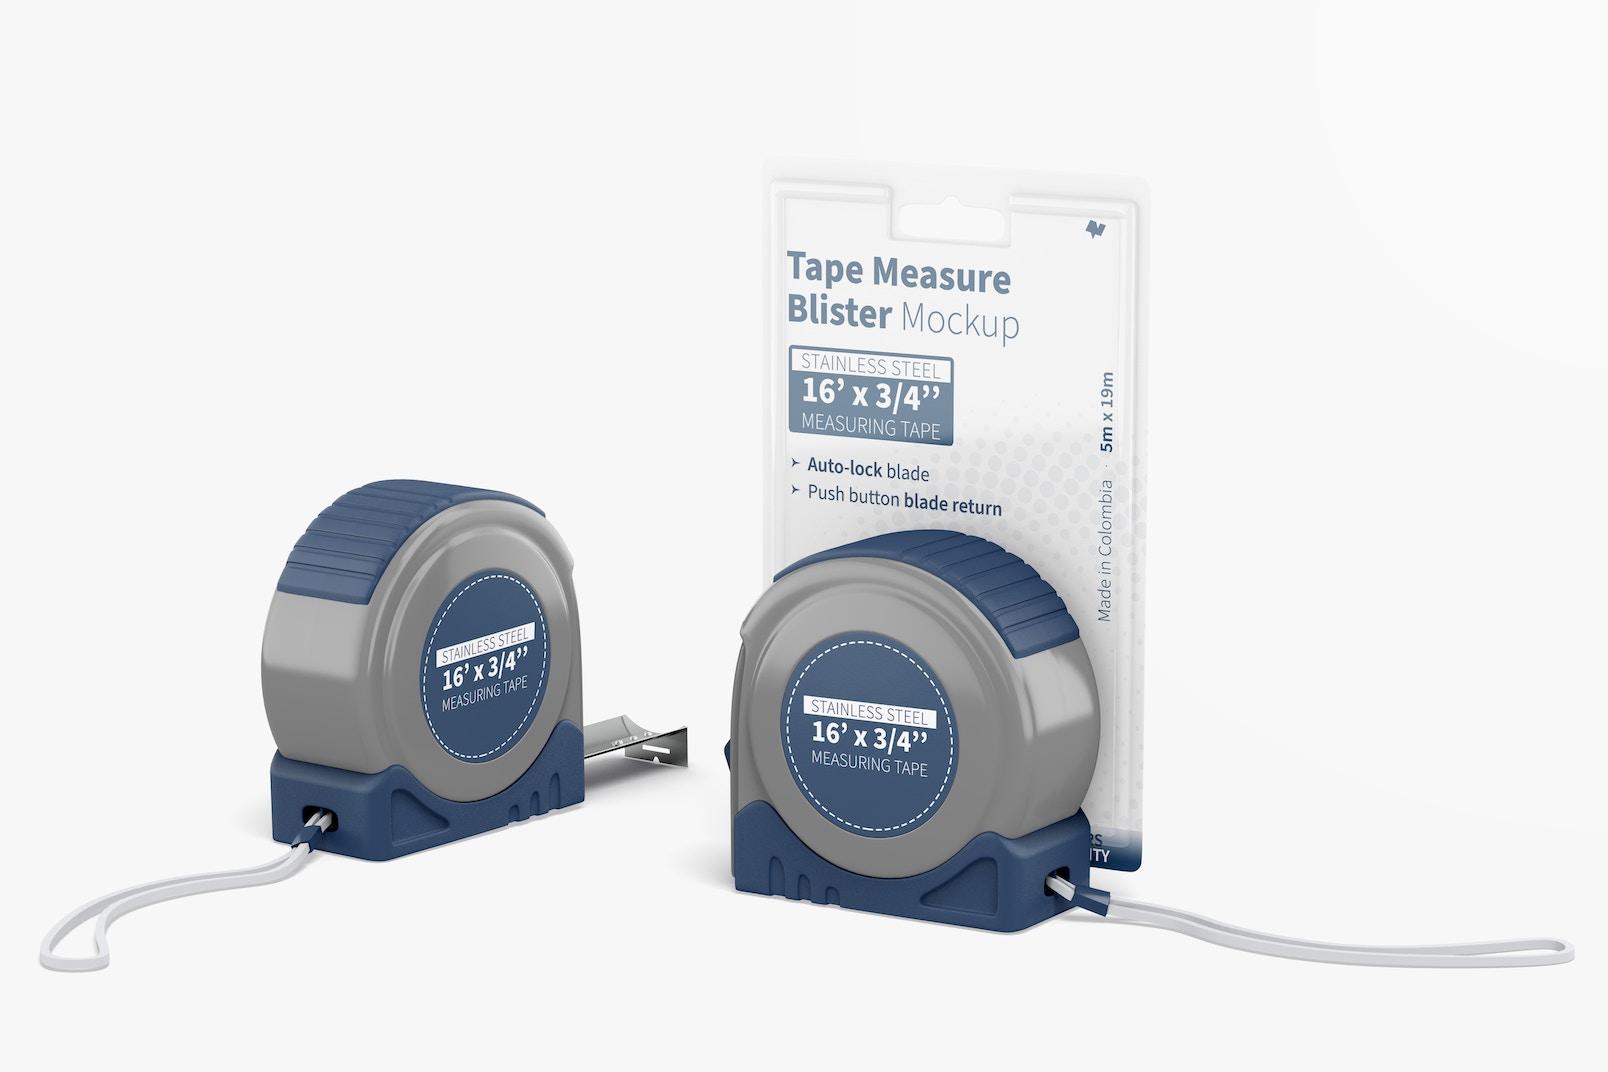 Tape Measure Blister Mockup